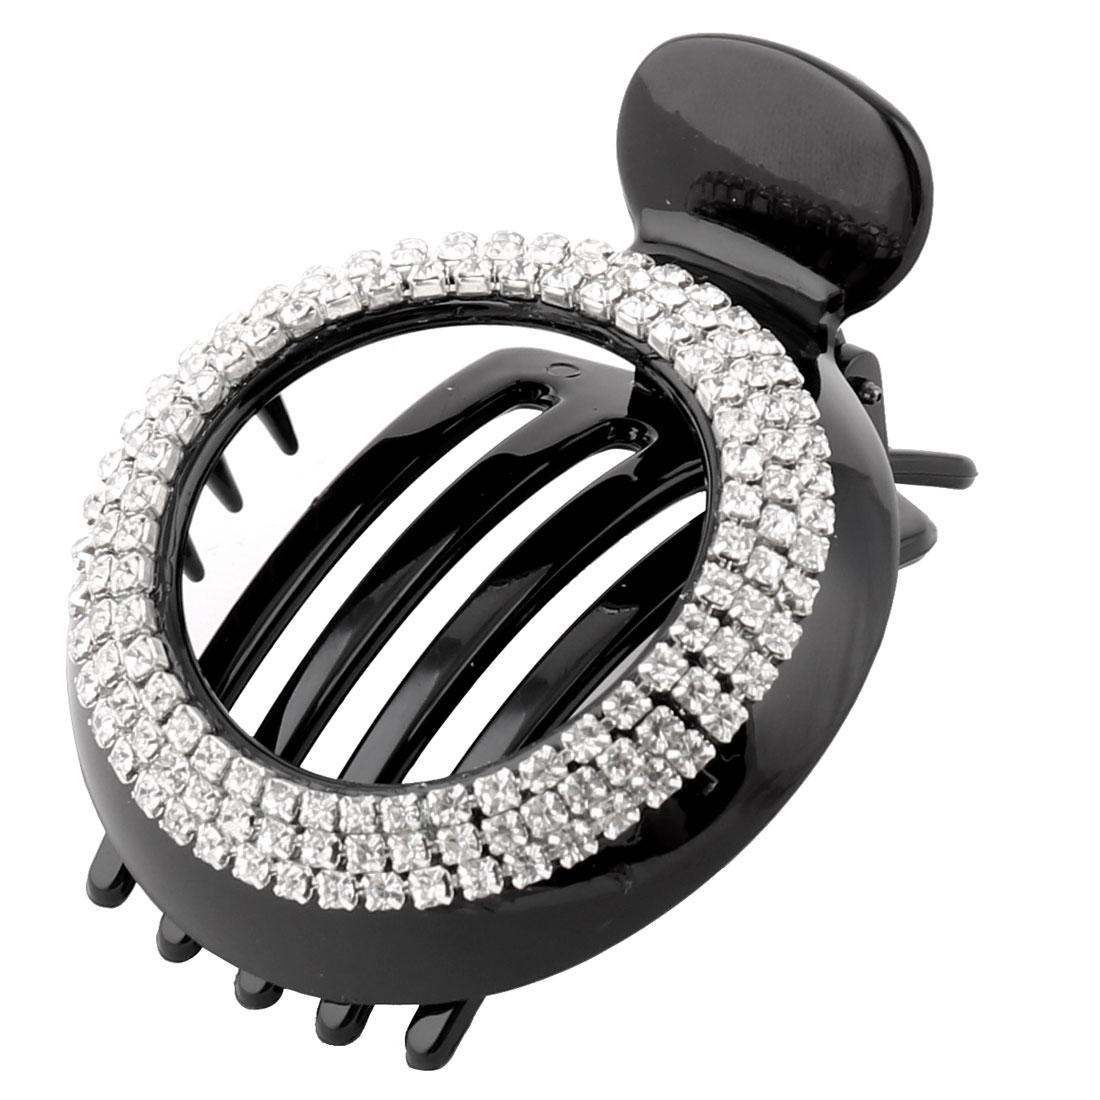 Household Women Plastic Rhinestone Decor Hairdressing Teethed Hair Clip Black